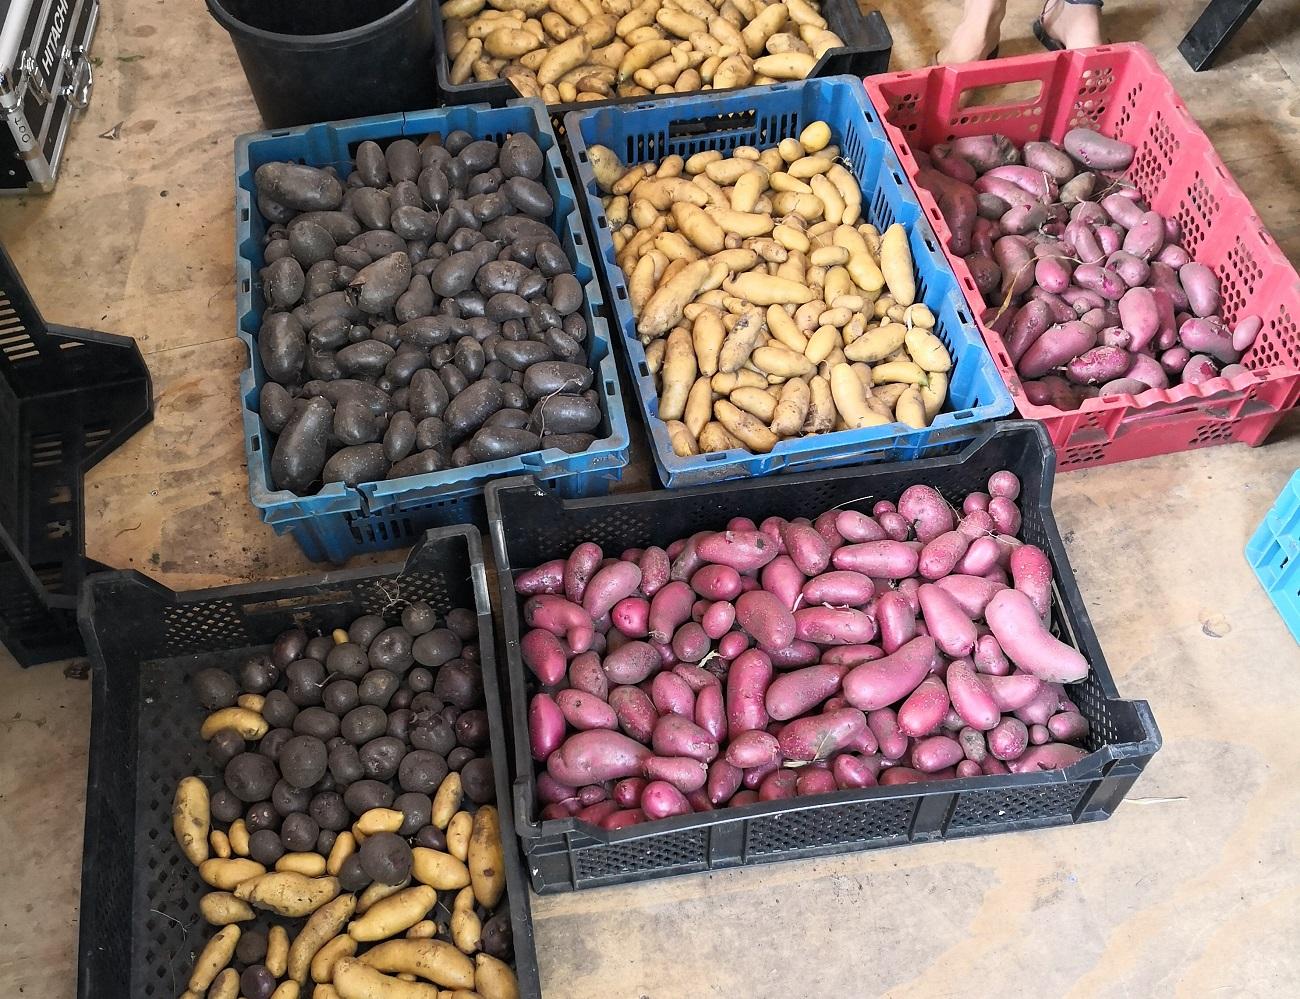 08-18 Aardappels krat.jpg